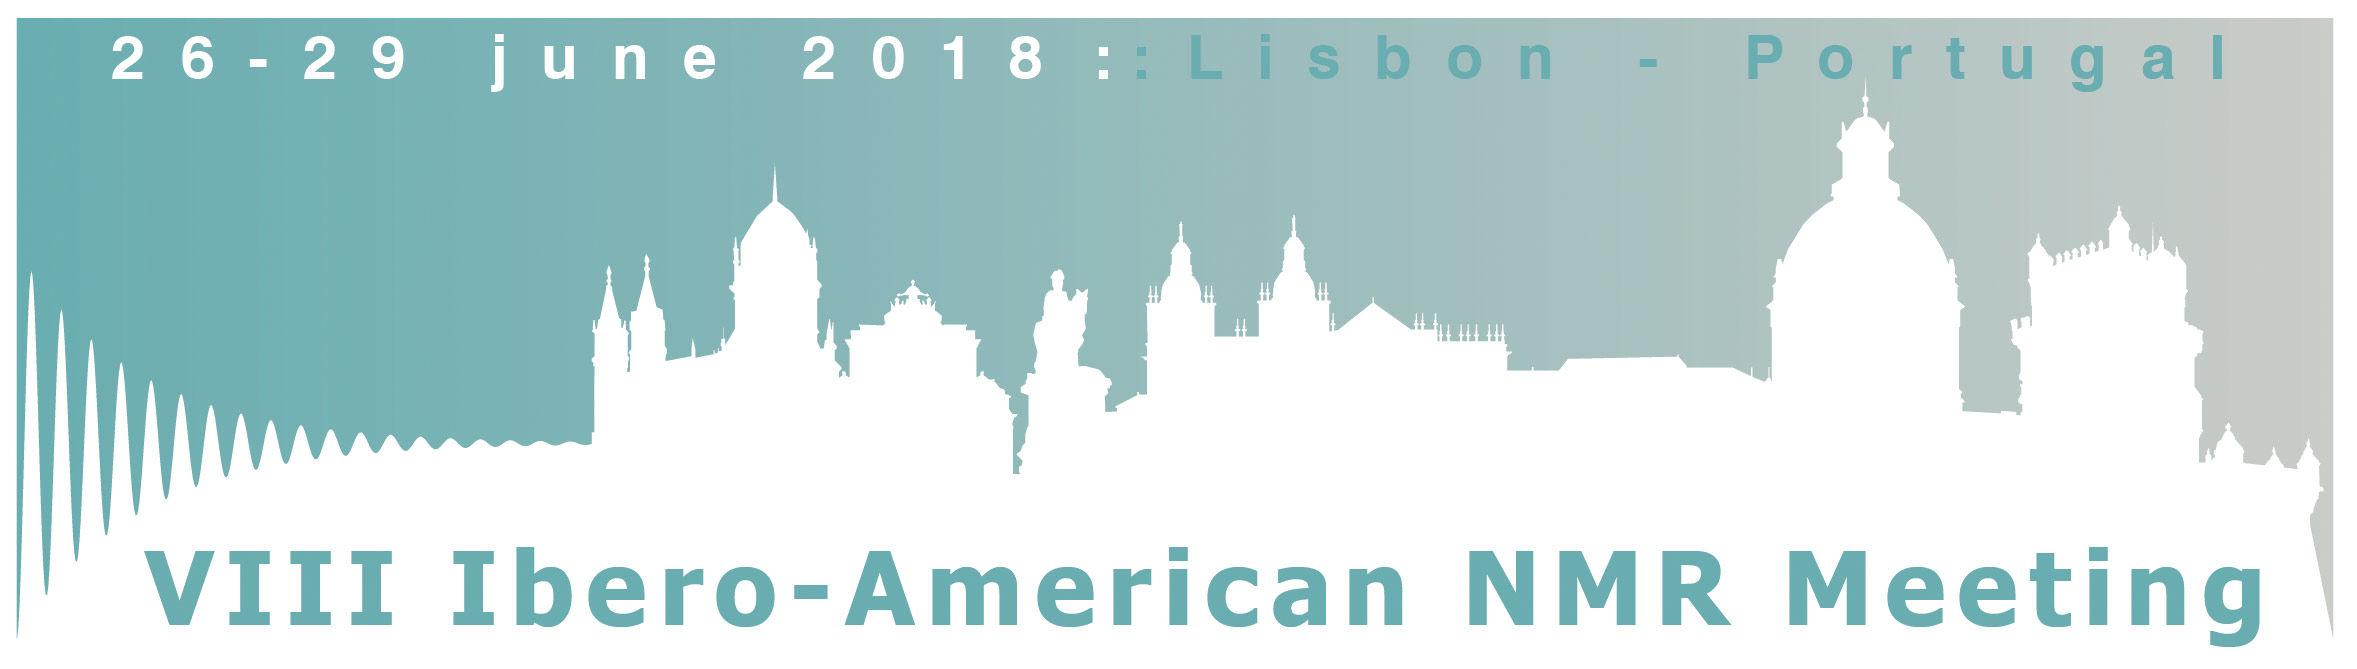 VIII Ibero-American NMR Meeting